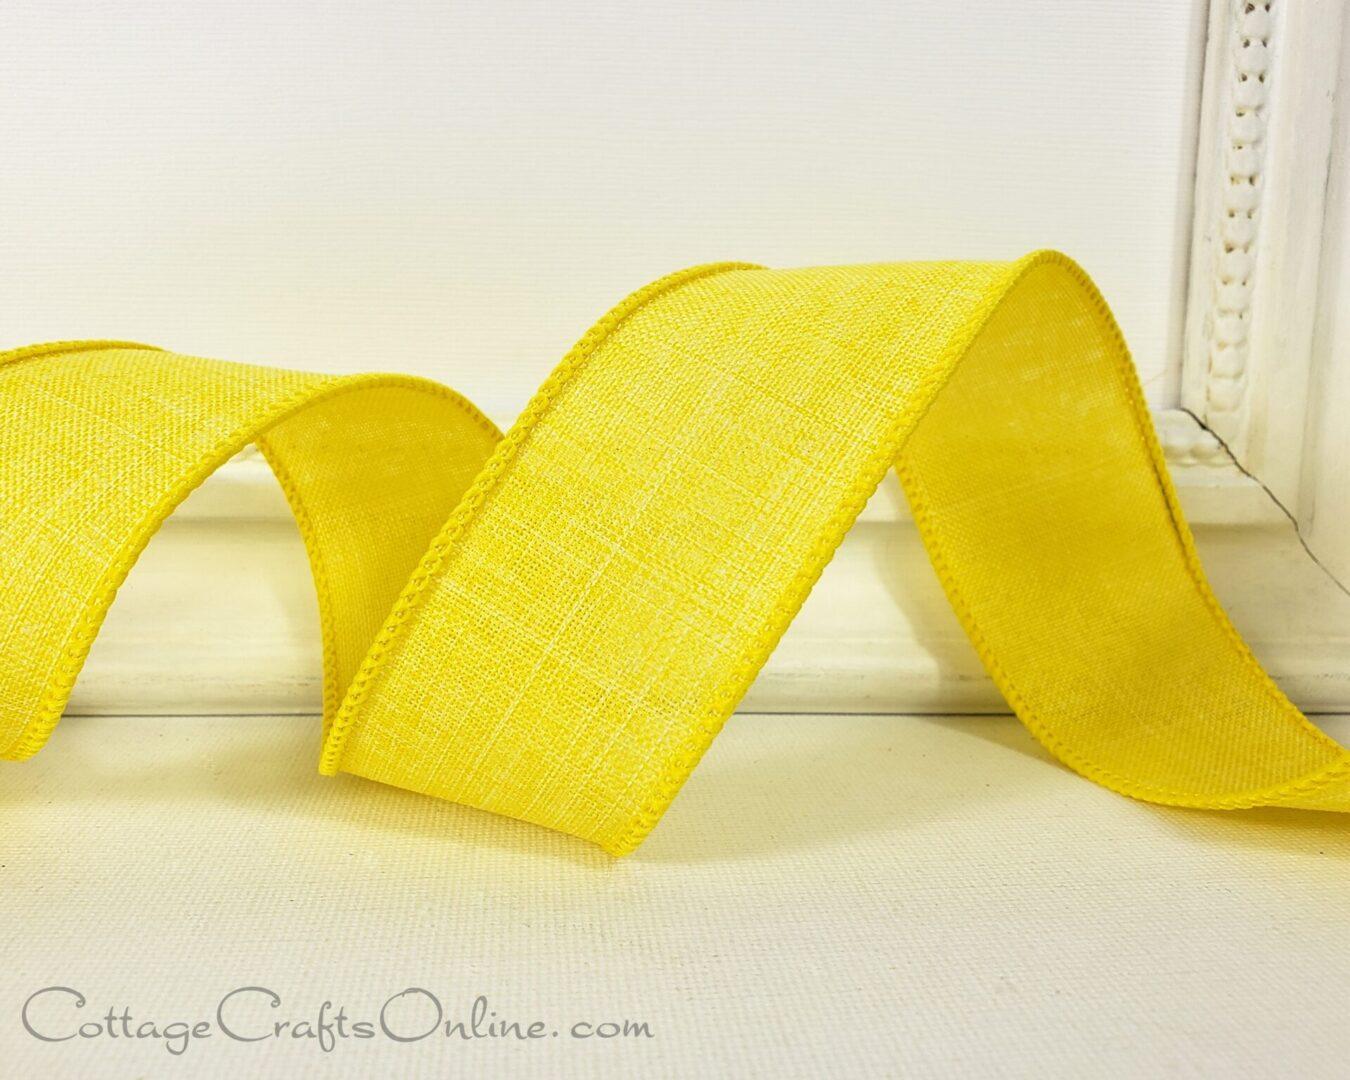 royal divine yellow 9 rg 127 829-006